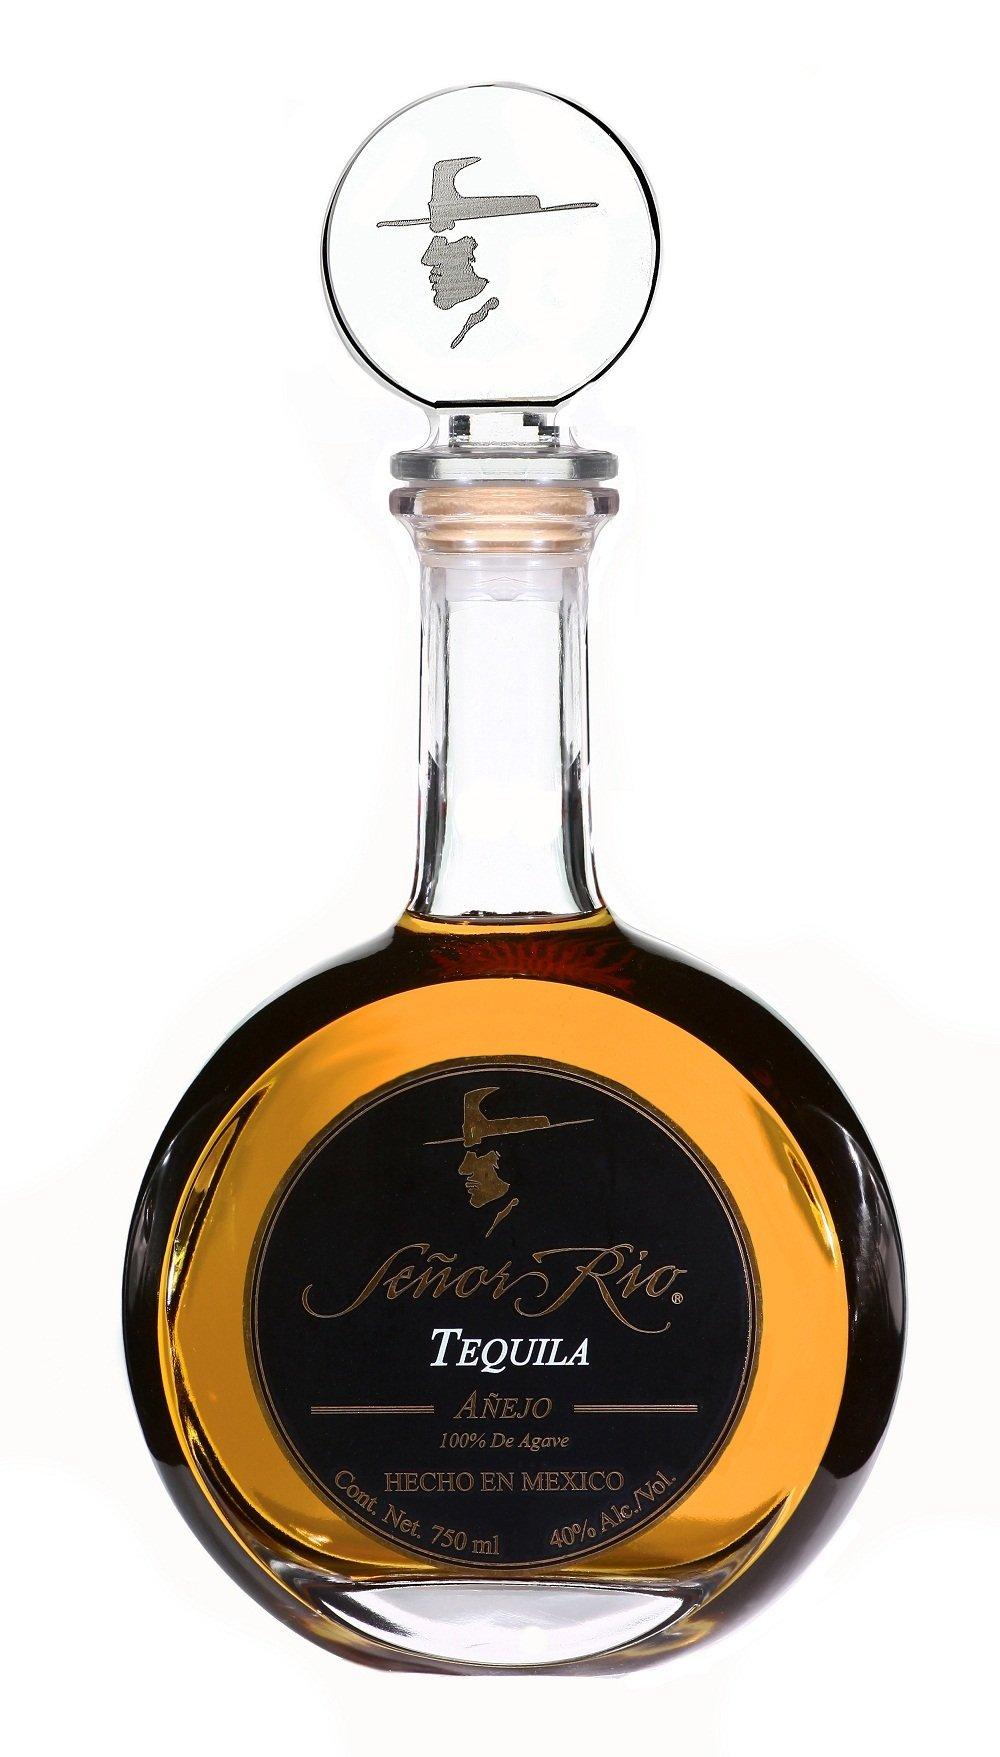 Senor Rio Anejo Tequila